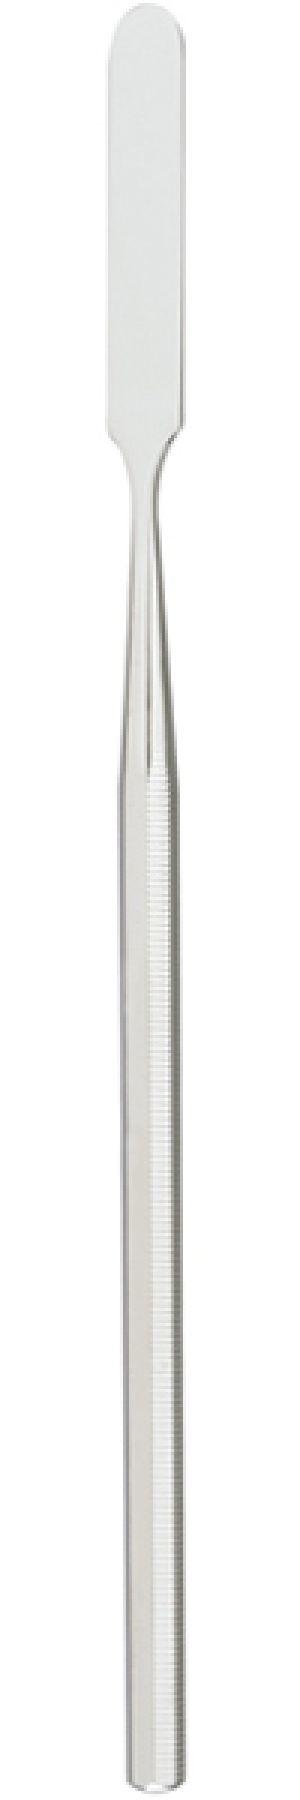 MI-66-106 Dental Cement Spatula